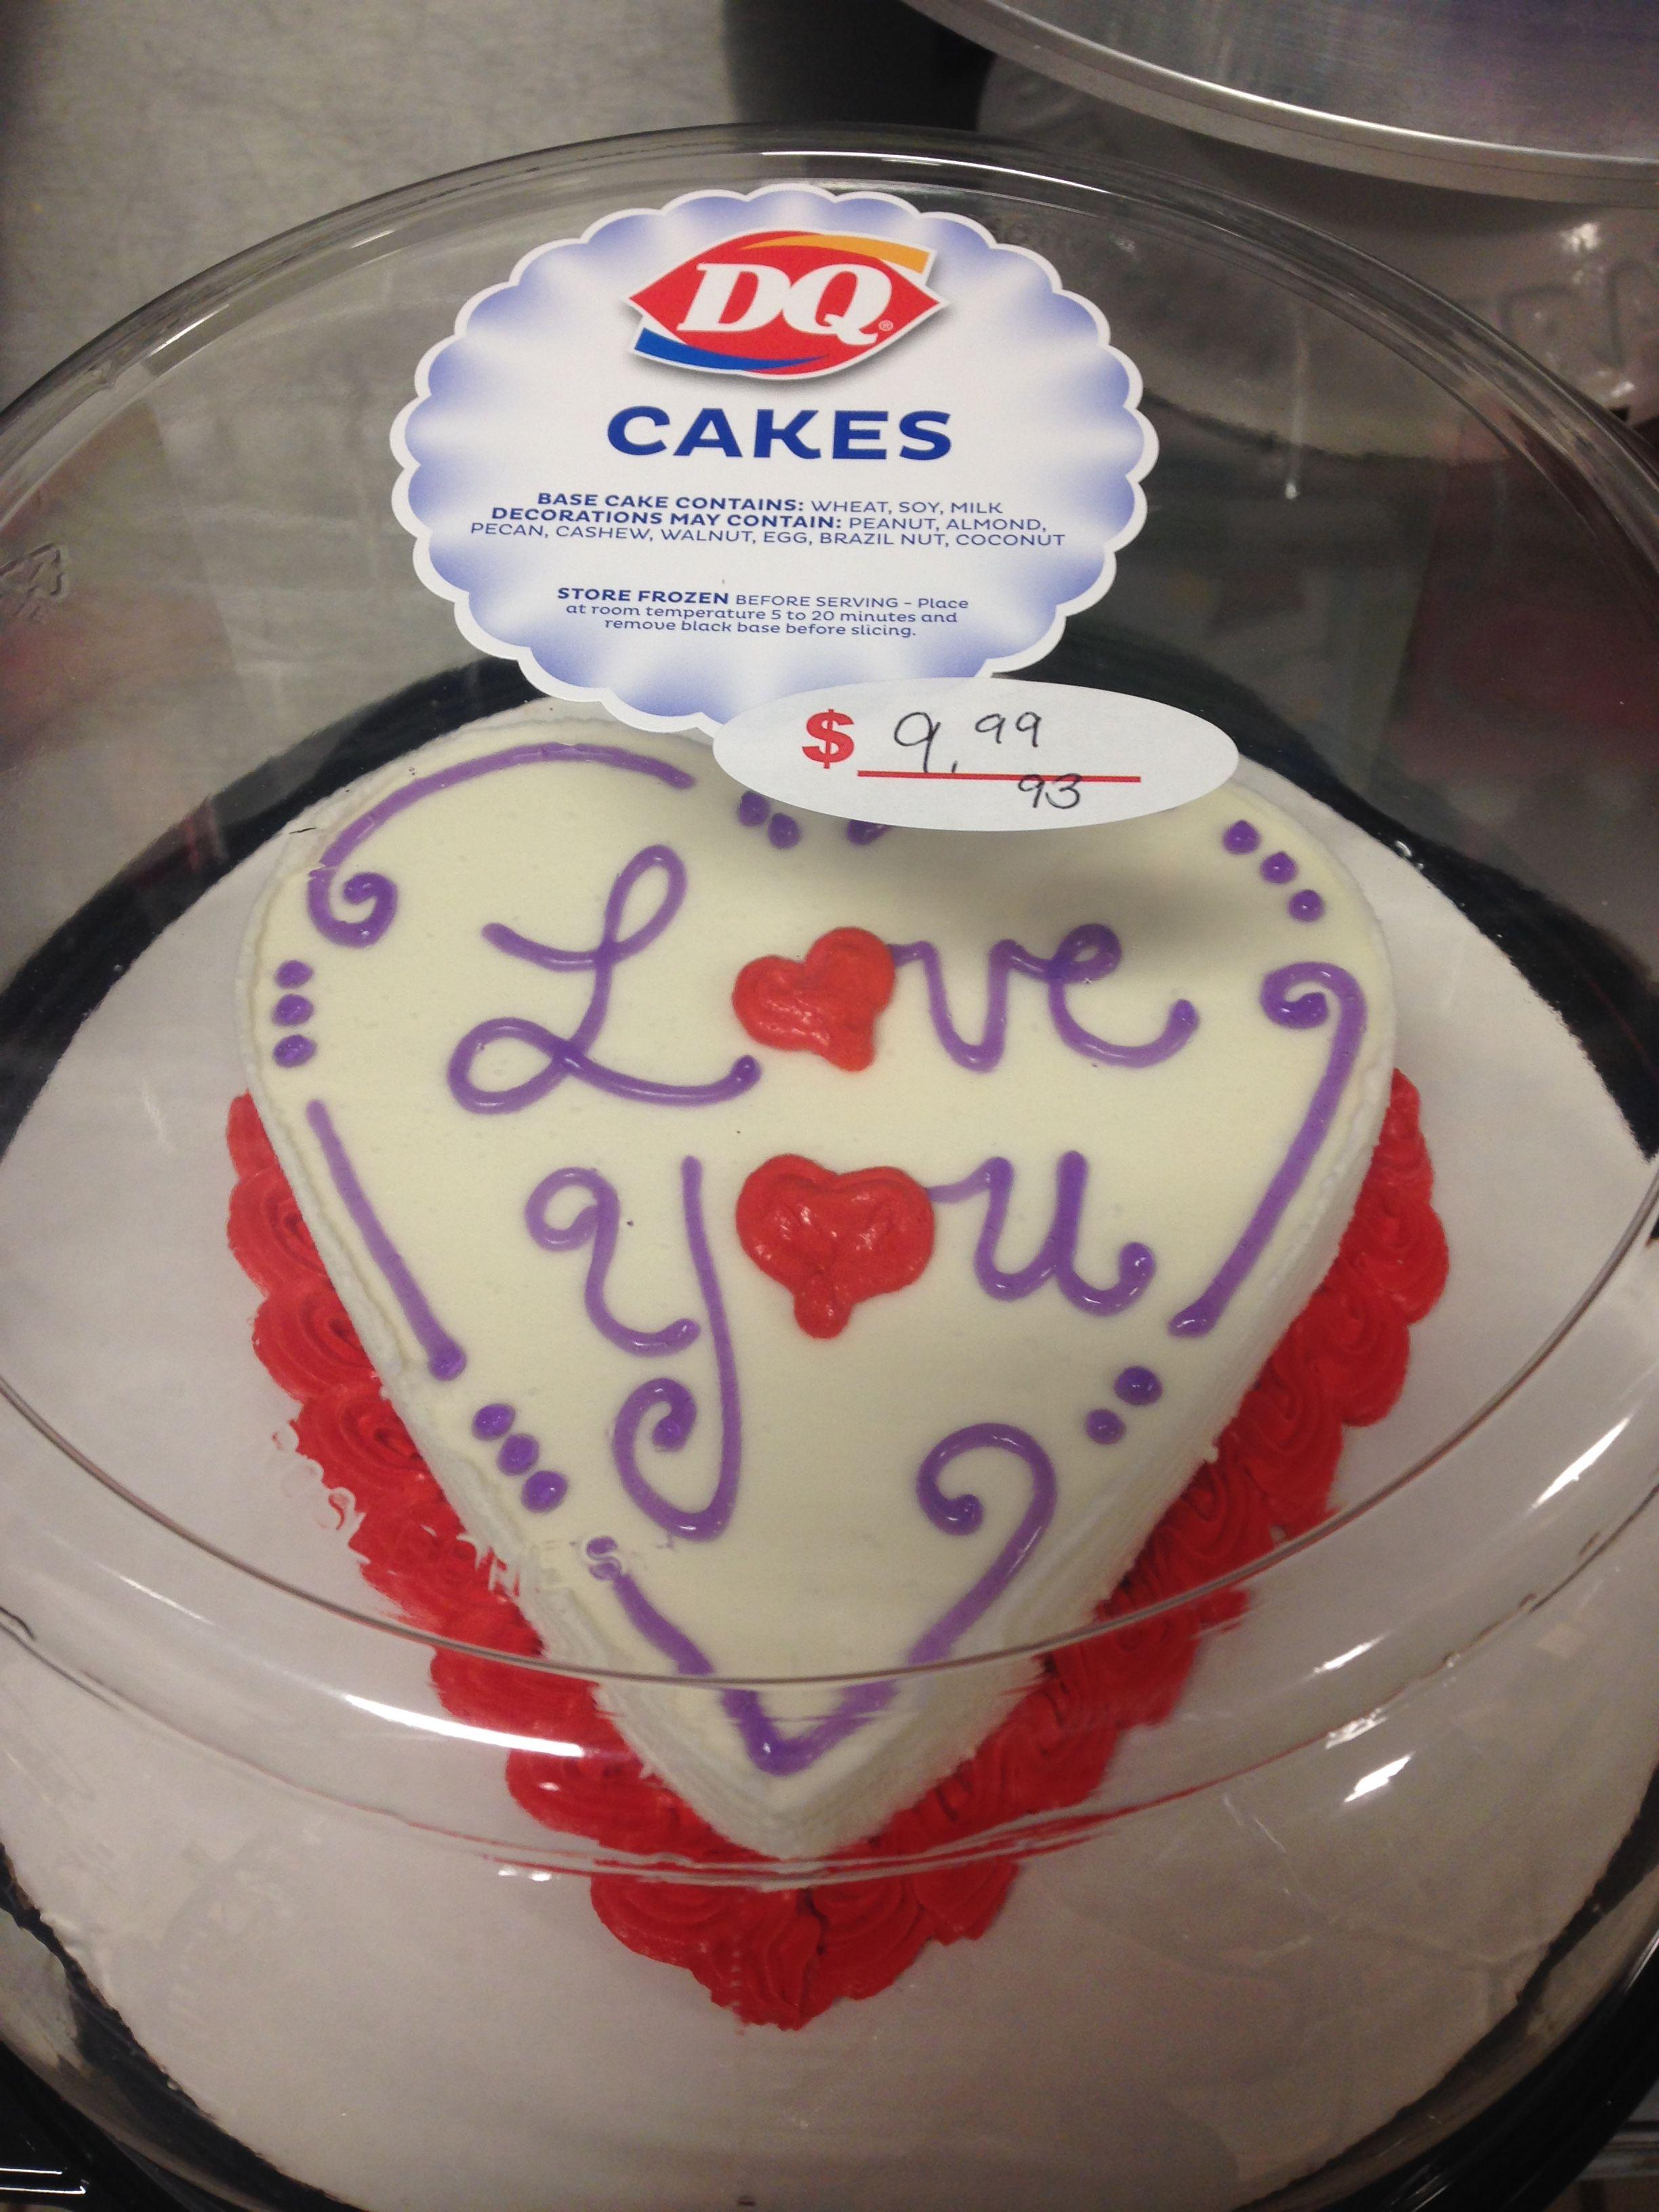 Dq Ice Cream Mini Heart Cake With Images Dairy Queen Ice Cream